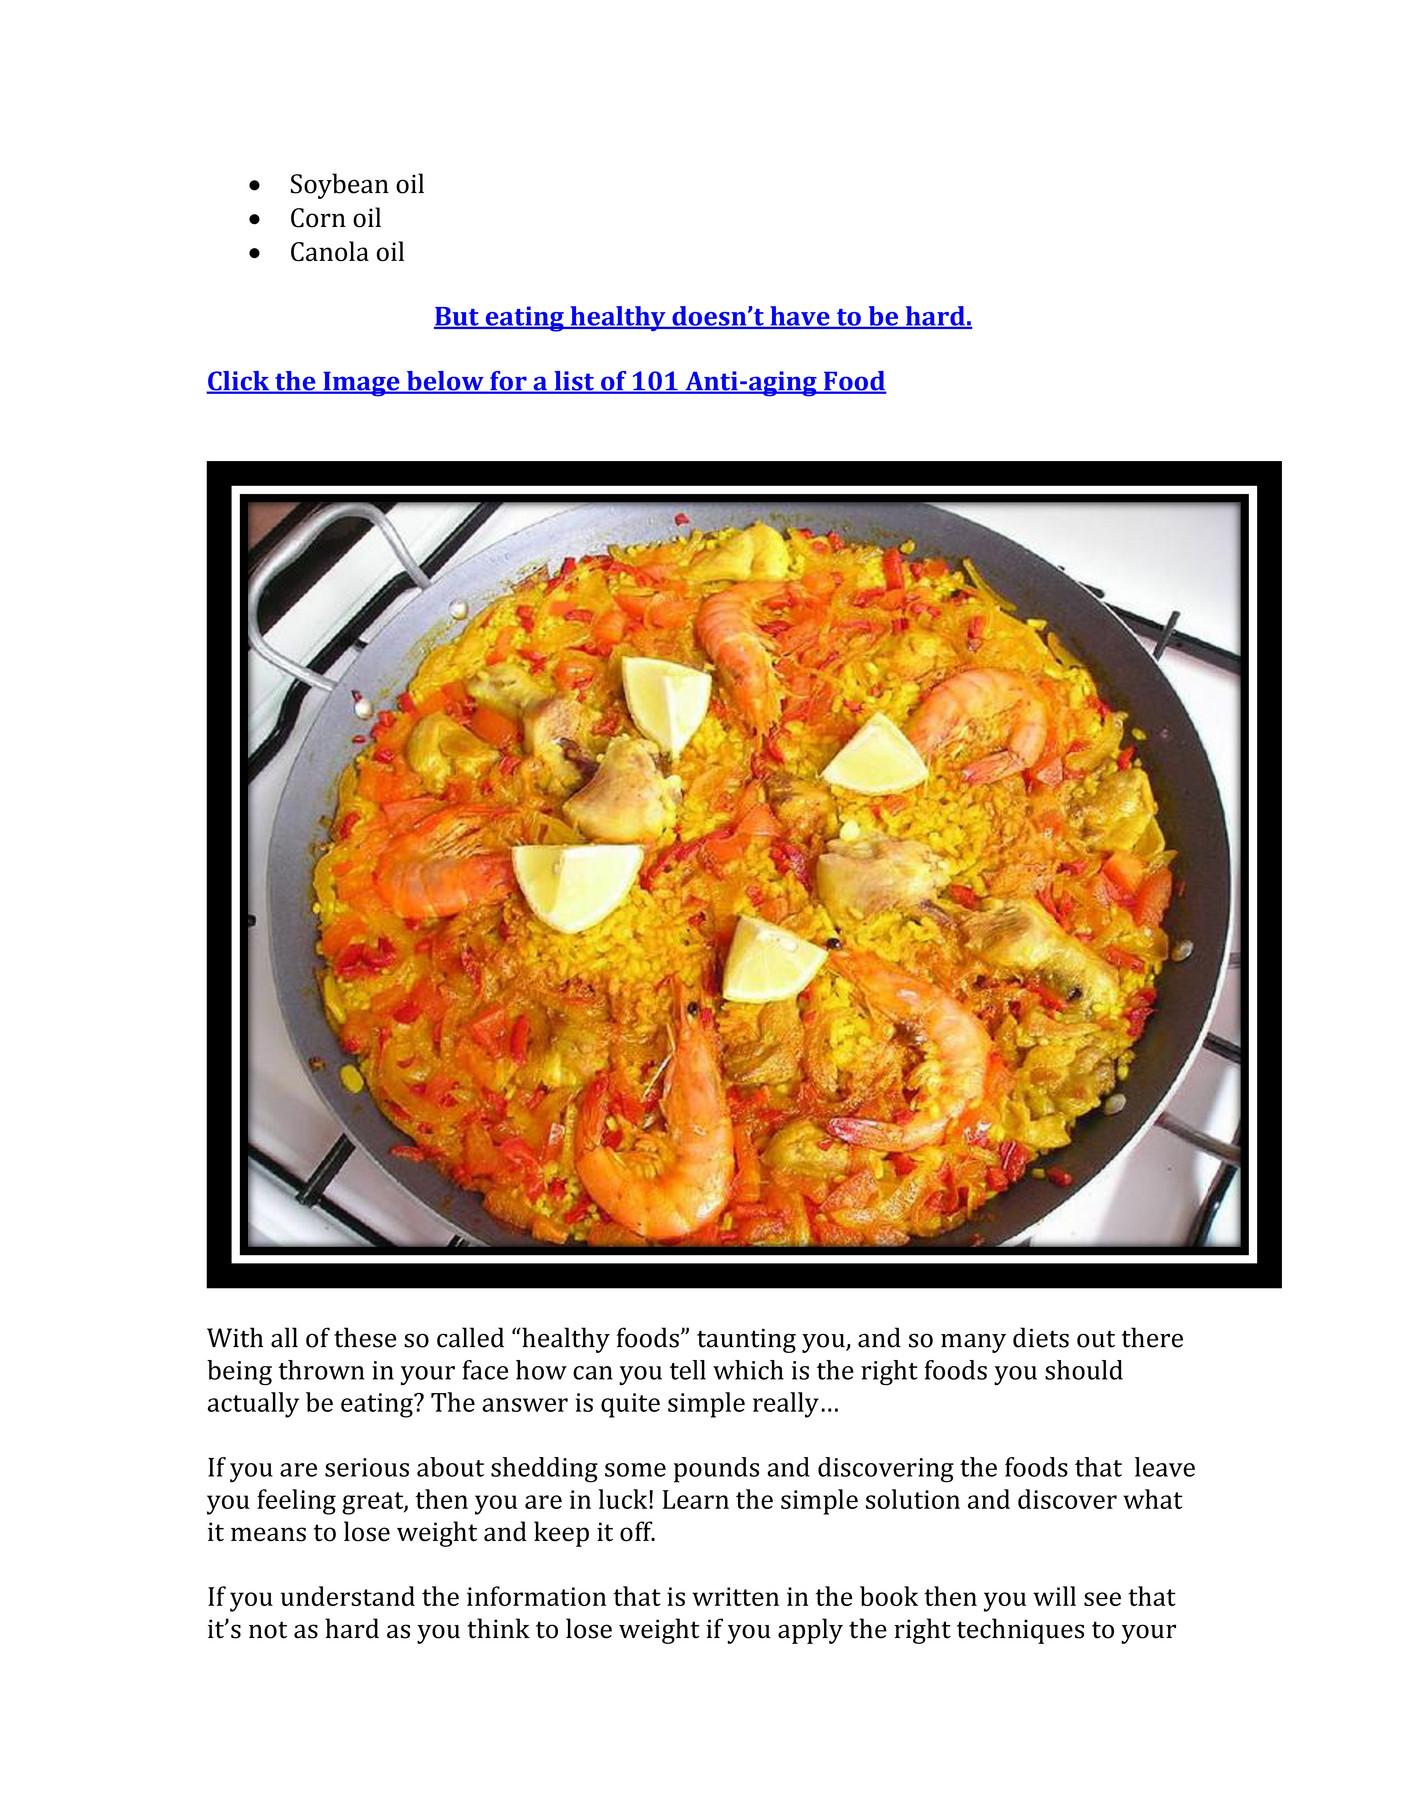 mirandasenuke weight loss anti aging food and cocking recipe